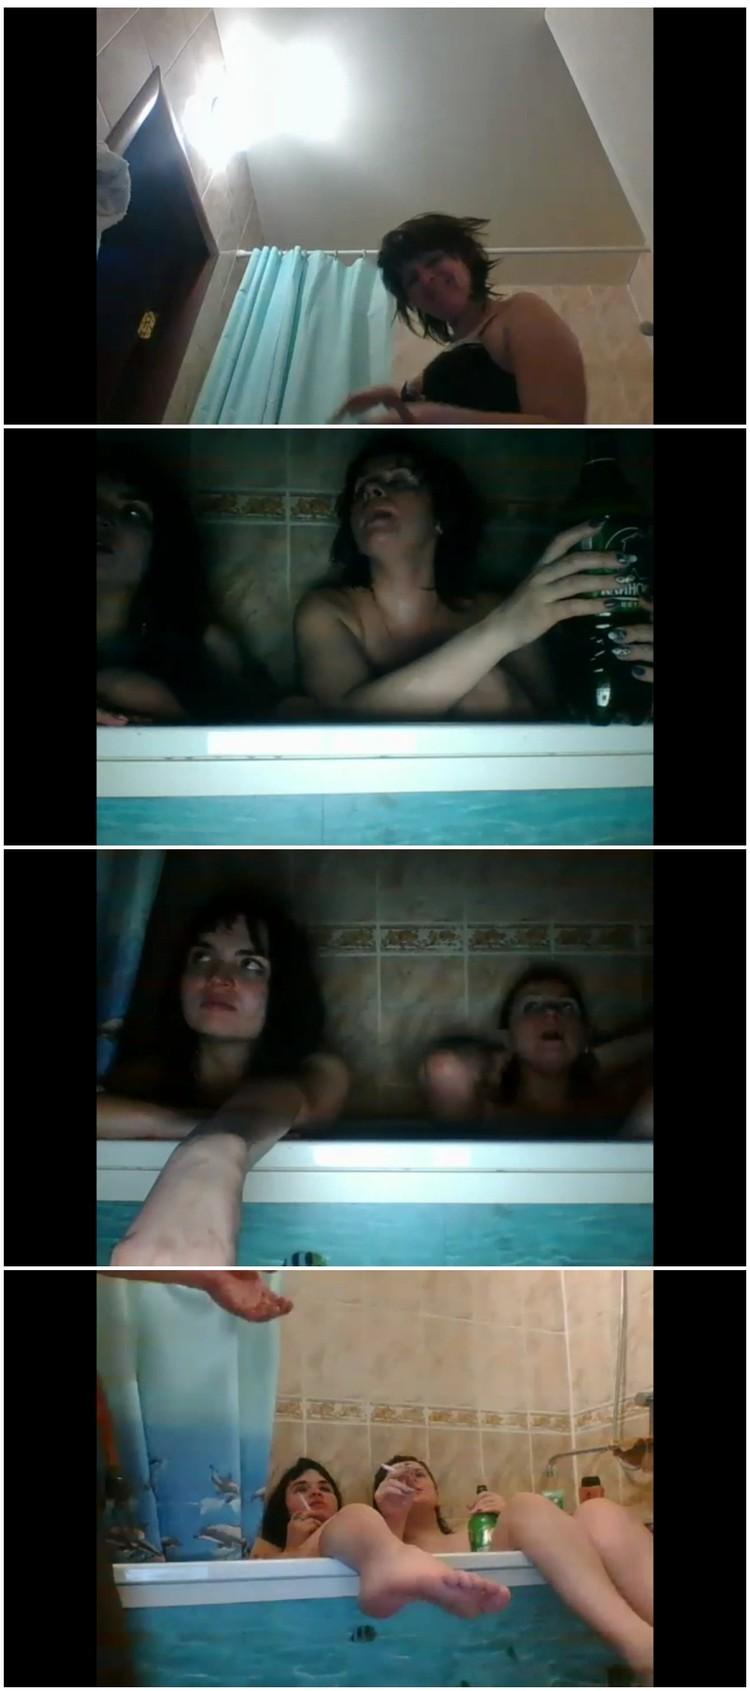 DrunkgirlsloveVZ-n042_cover_l.jpg